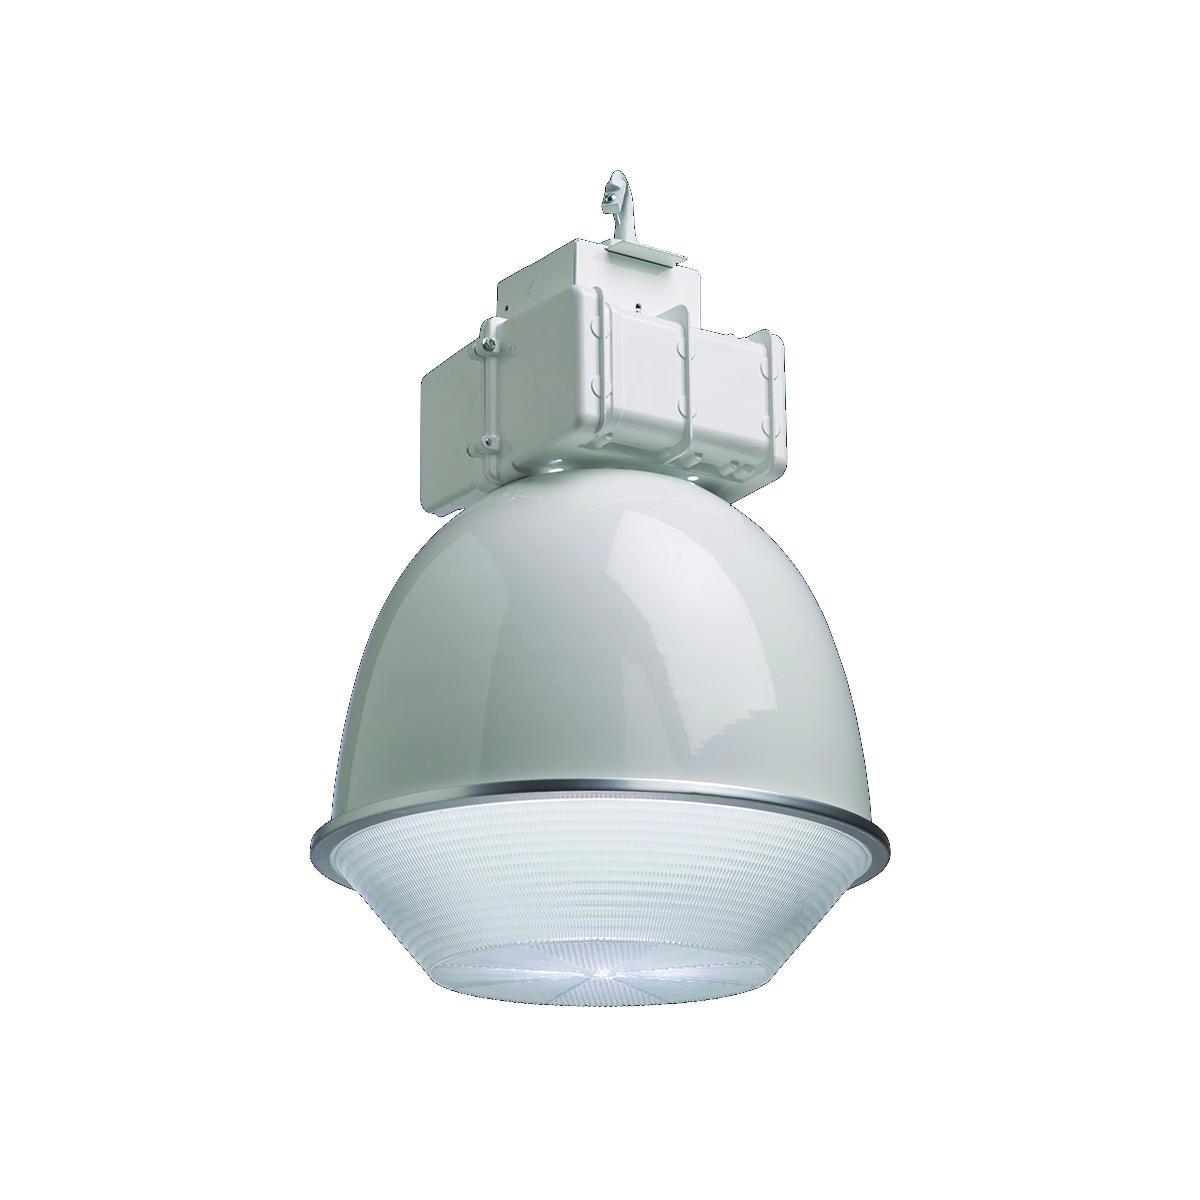 Bl400plb Bl400plbq By Hubbell Industrial Lighting